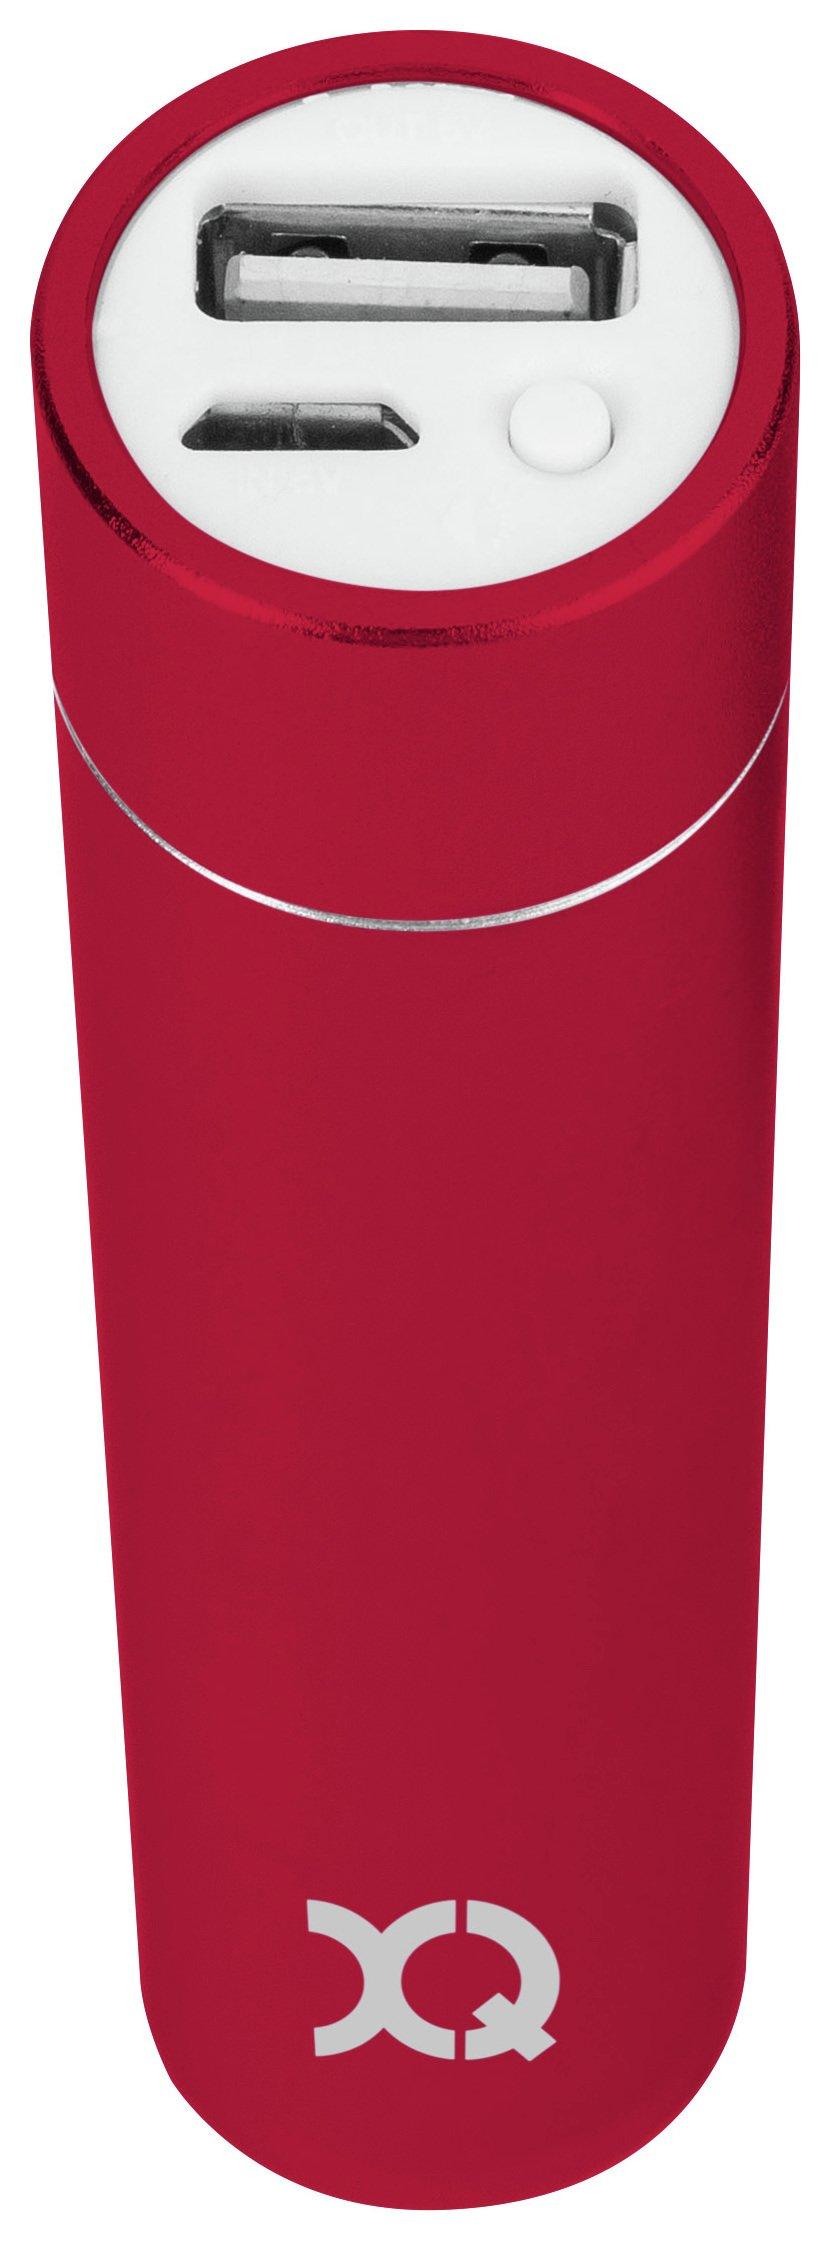 Xqisit Xqisit 2600mAh Power Bank - Red.